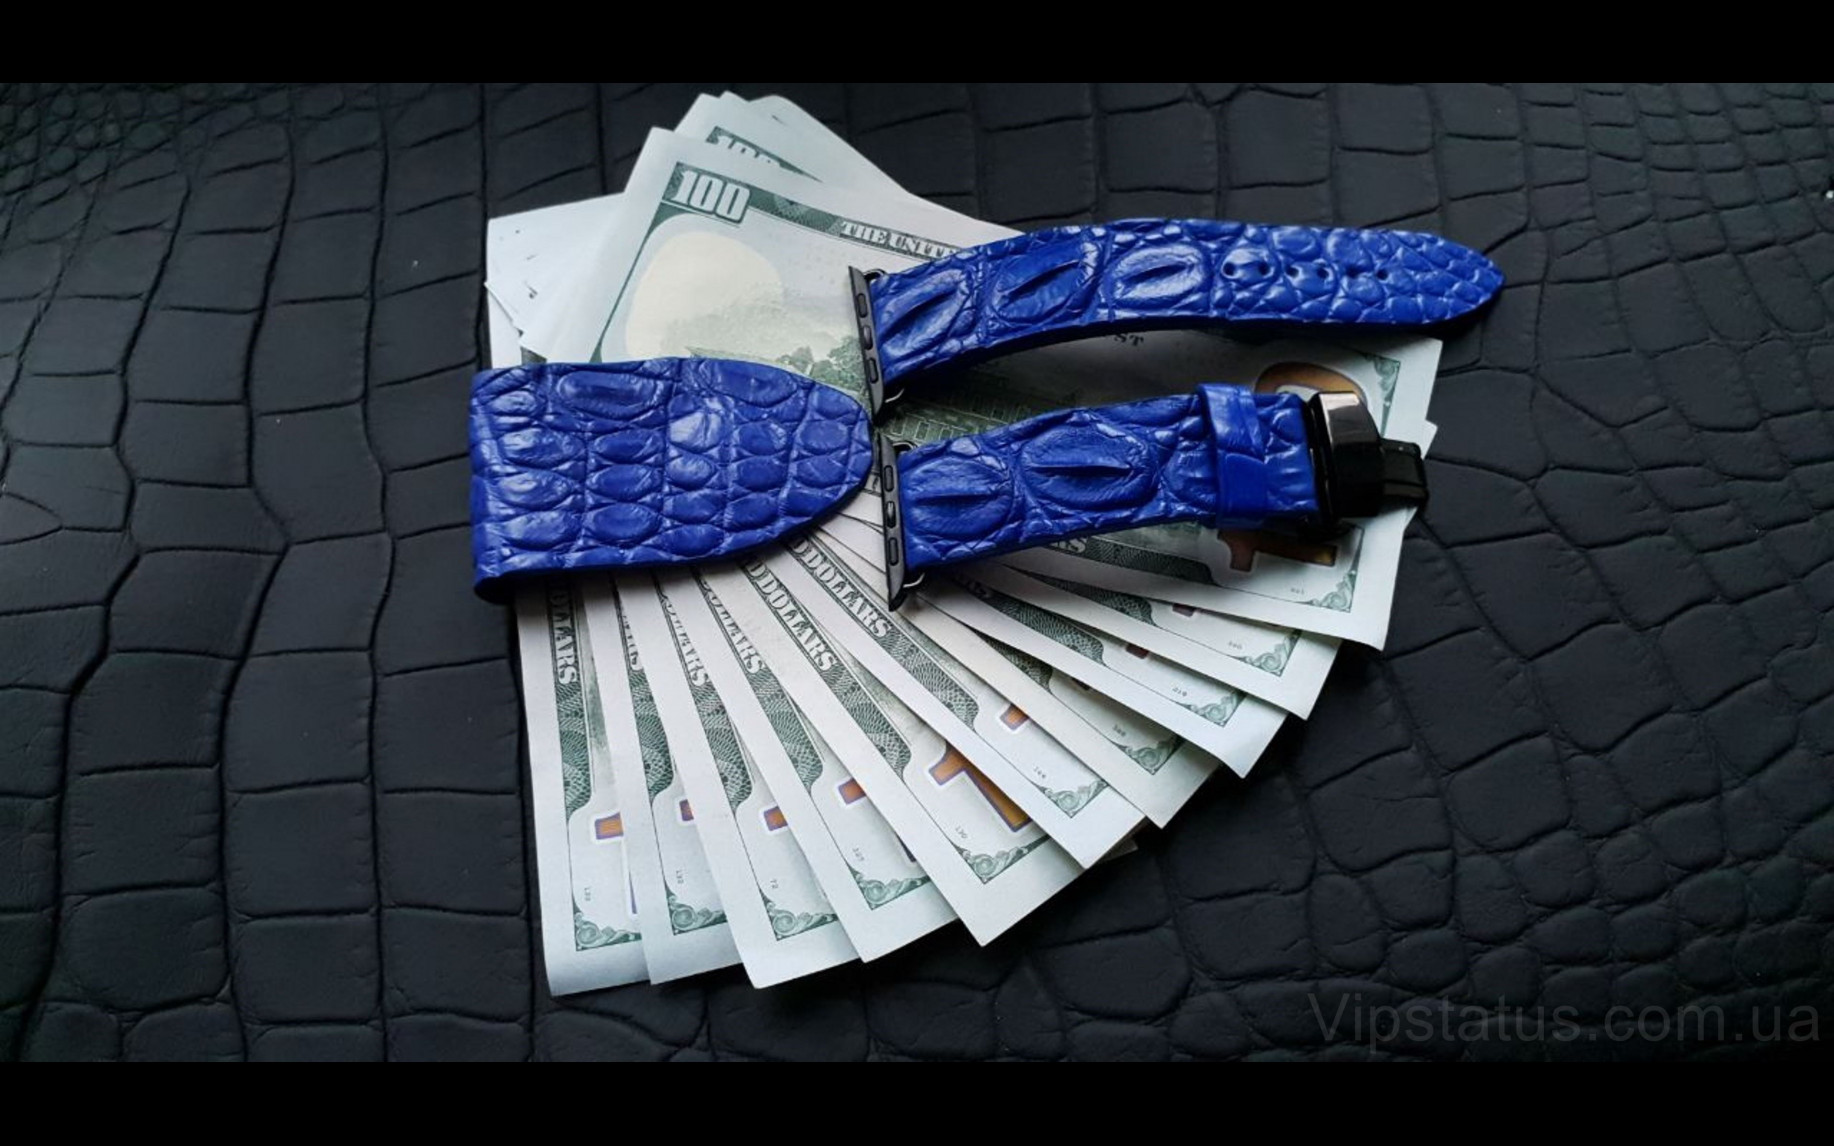 Elite Blue King Вип зажим для купюр Blue King Vip bill clip image 2